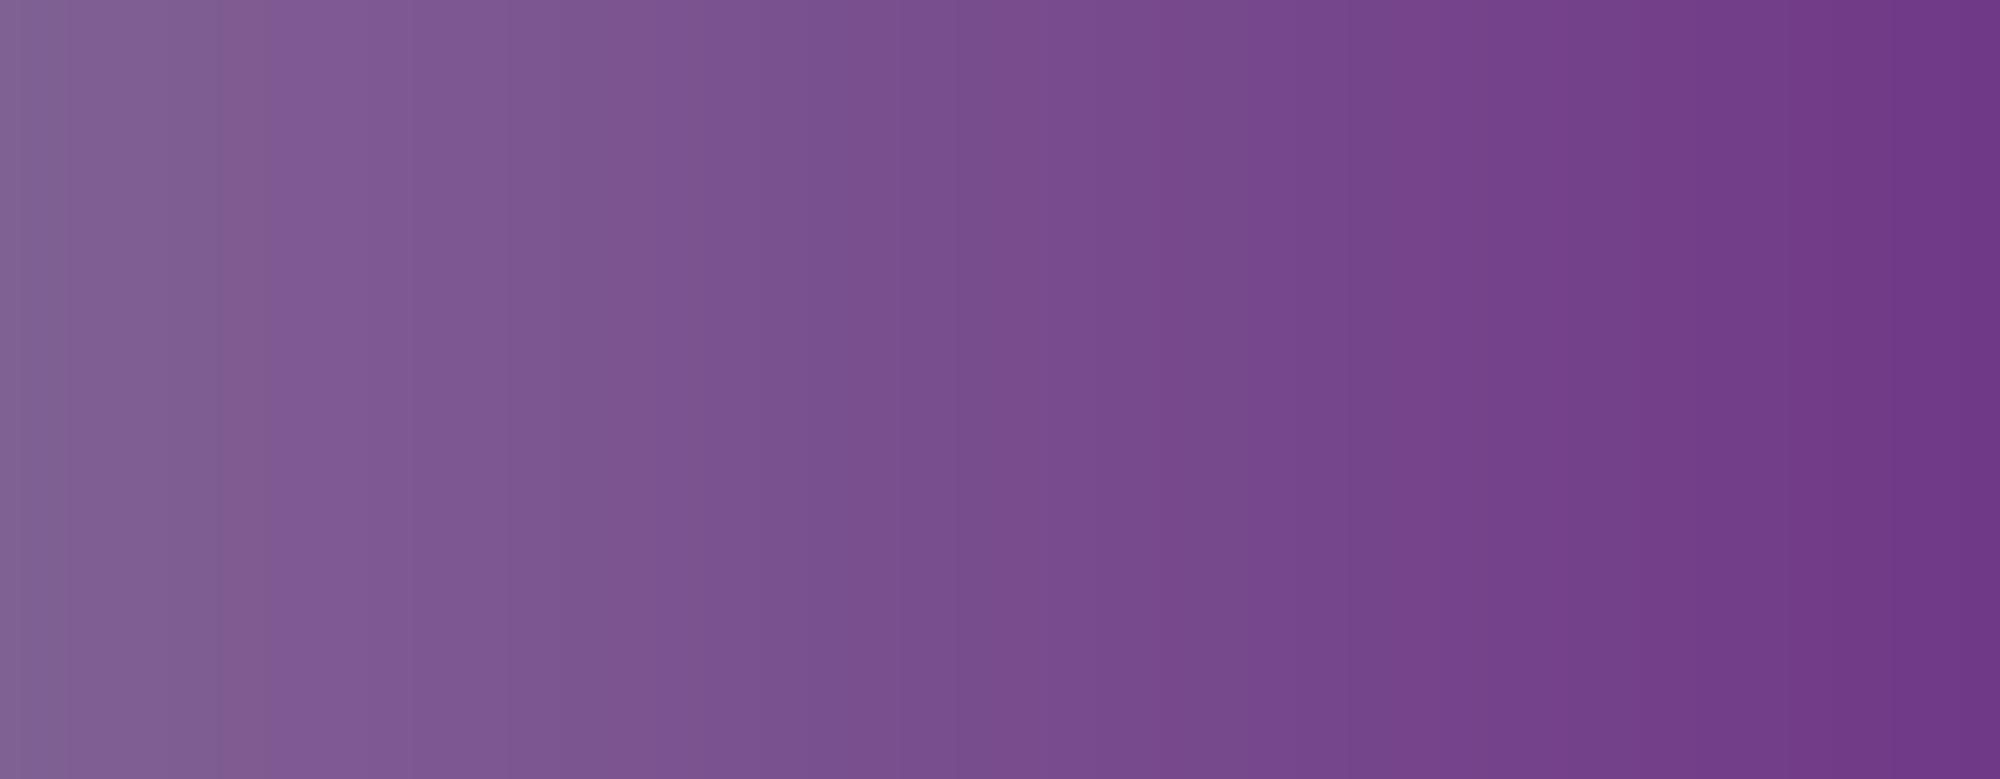 TRP Purple gradient